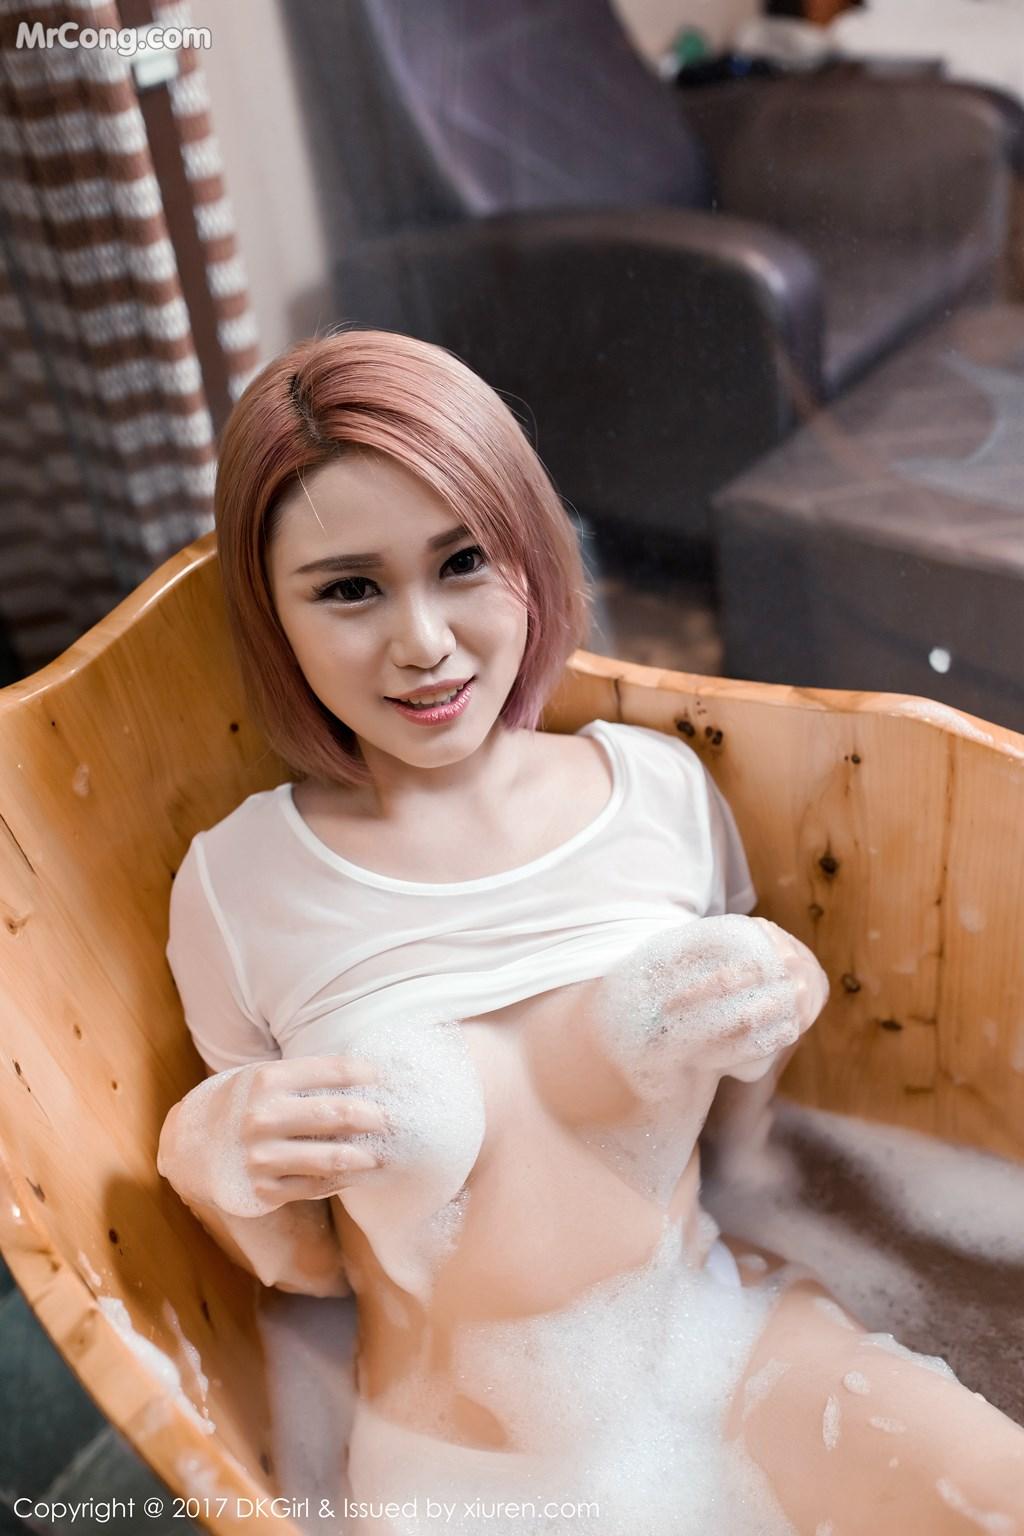 Image DKGirl-Vol.045-Meng-Bao-Er-BoA-MrCong.com-046 in post DKGirl Vol.045: Người mẫu Meng Bao Er (萌宝儿BoA) (56 ảnh)